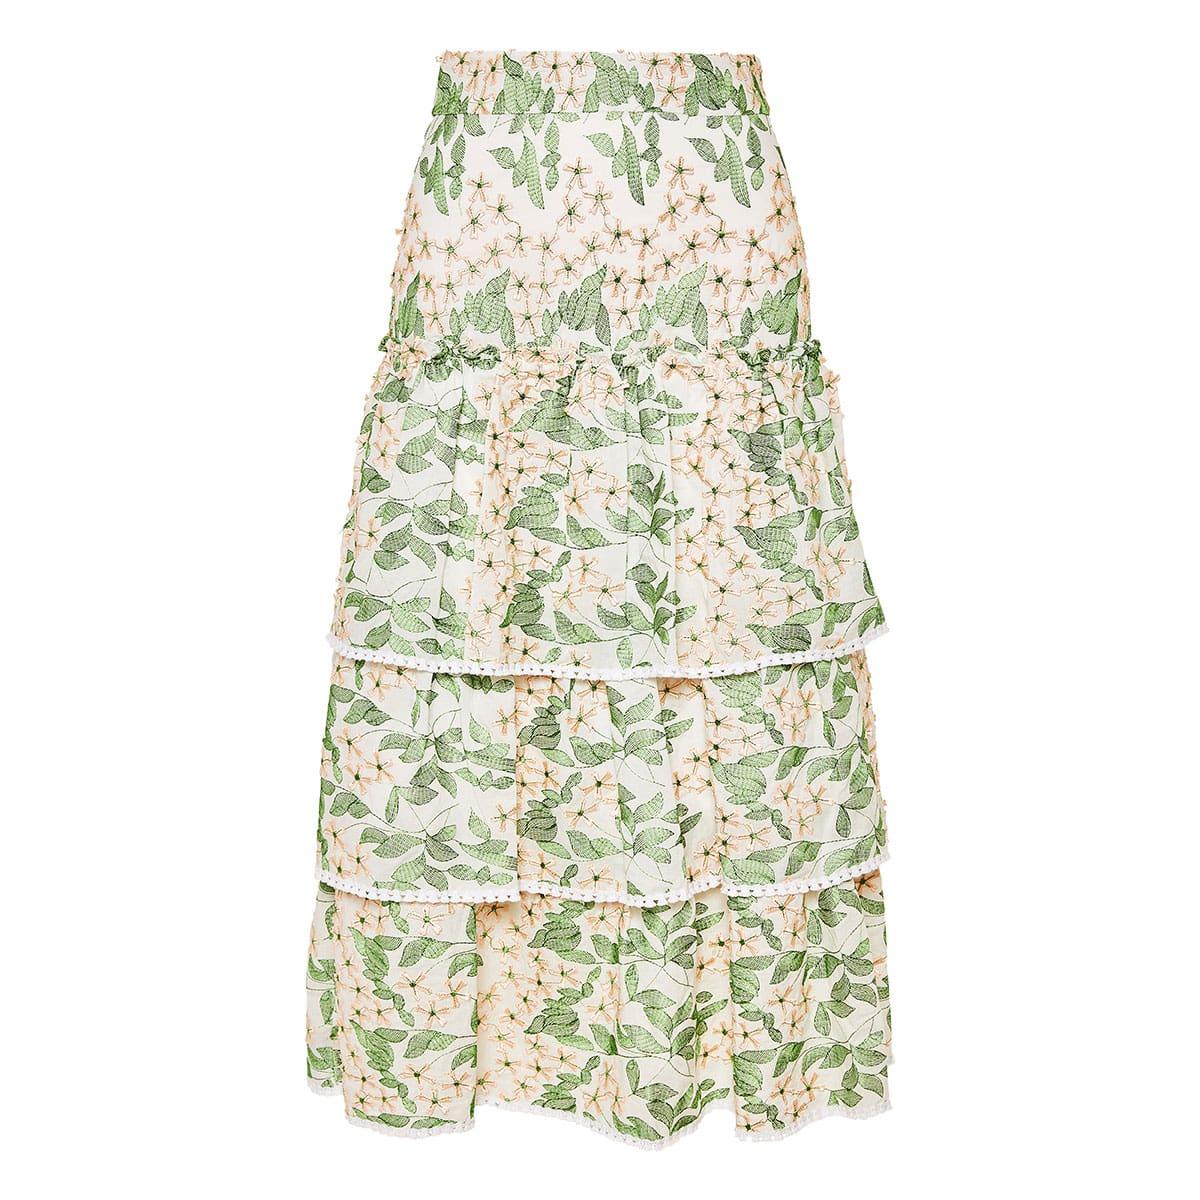 Aditya floral-embroidered tiered midi skirt